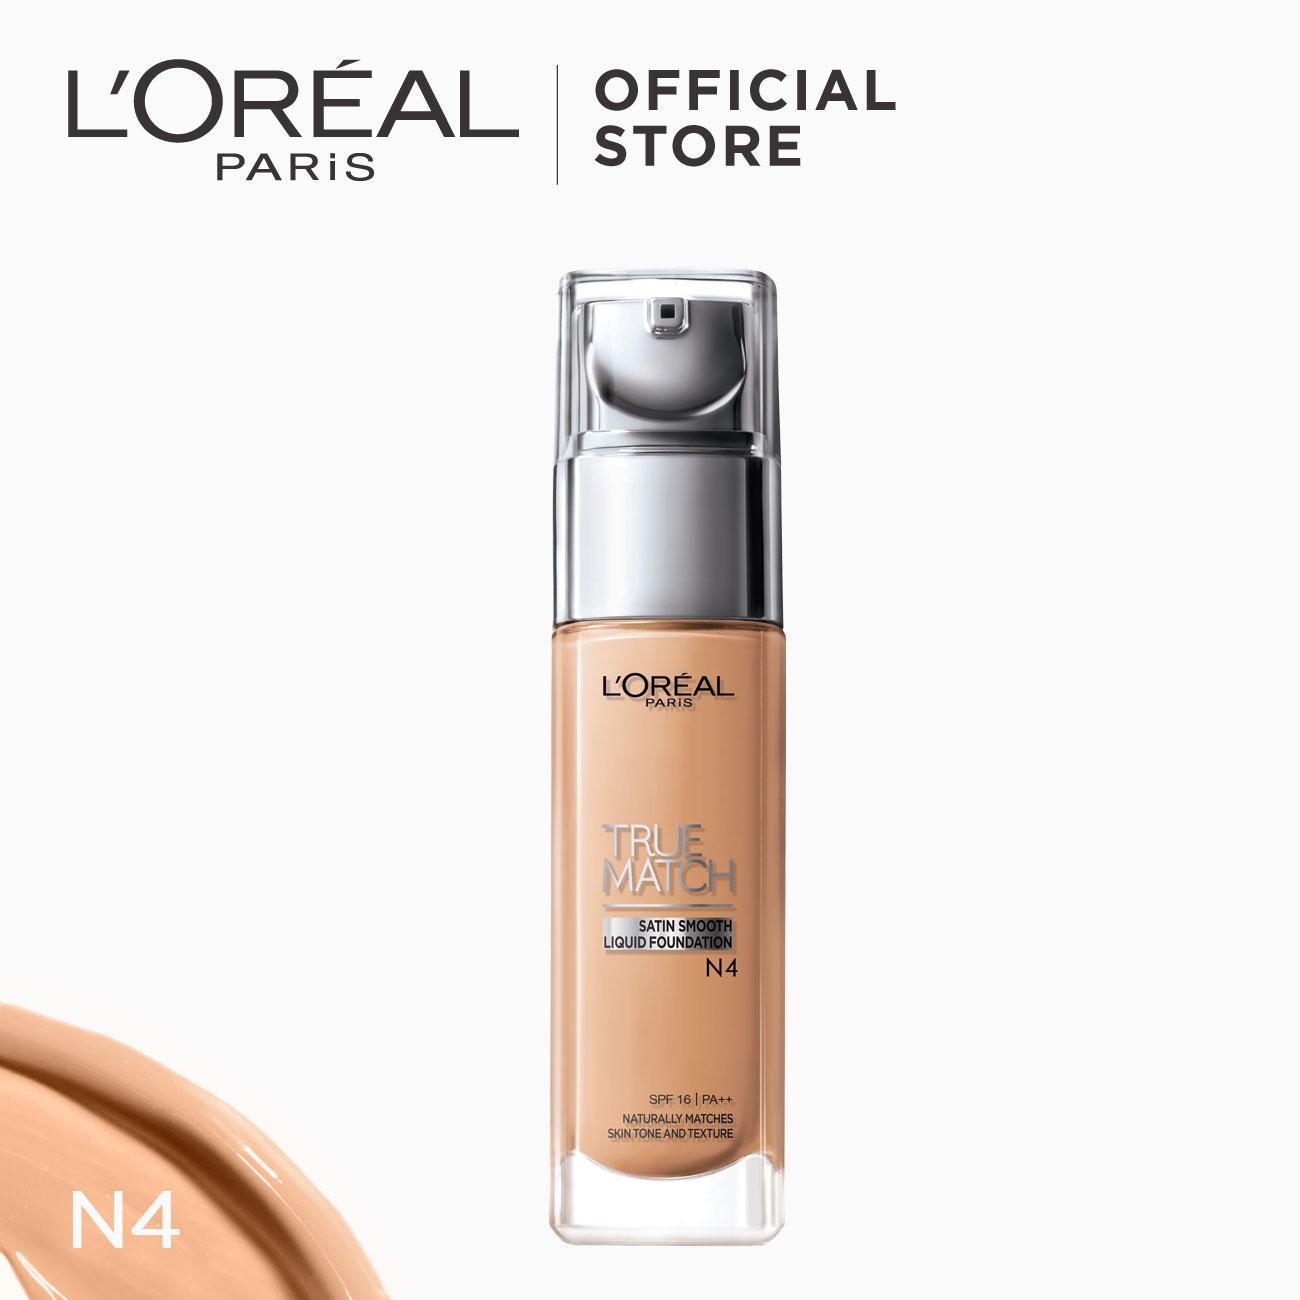 True Match Natural Finish Liquid Foundation - N4 Nude Beige by LOréal Paris Philippines